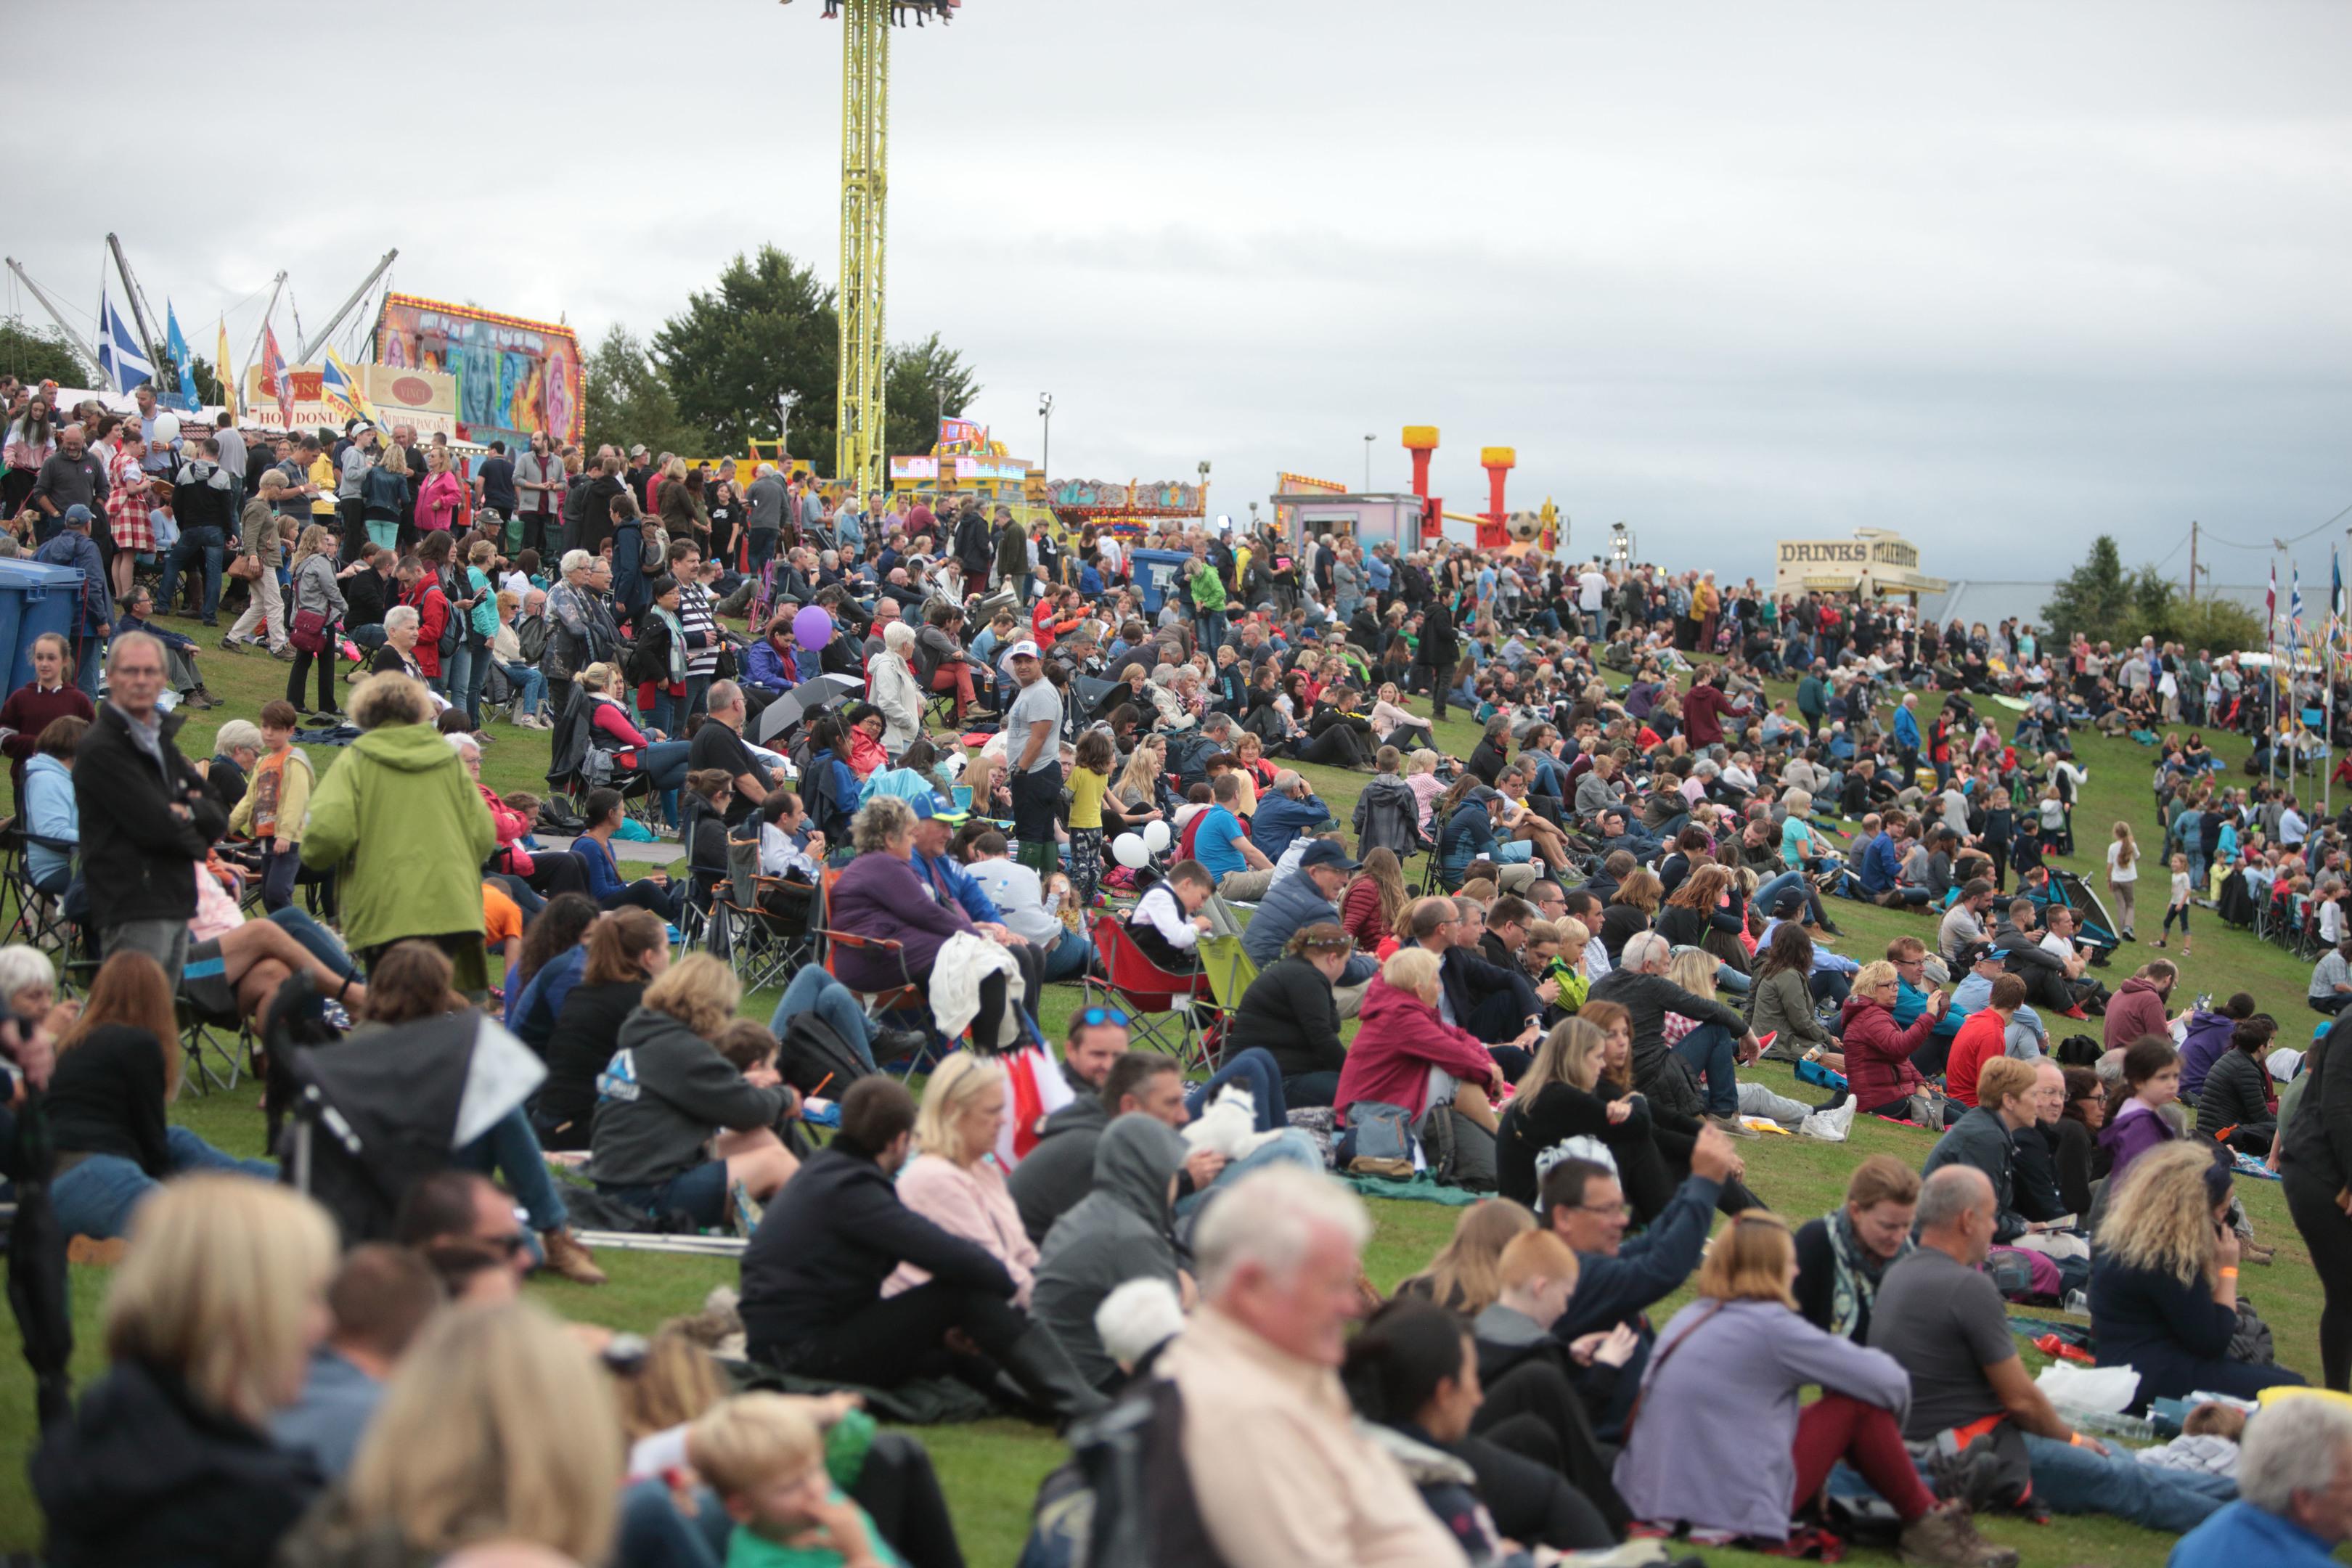 Busy Crieff Highland Games.